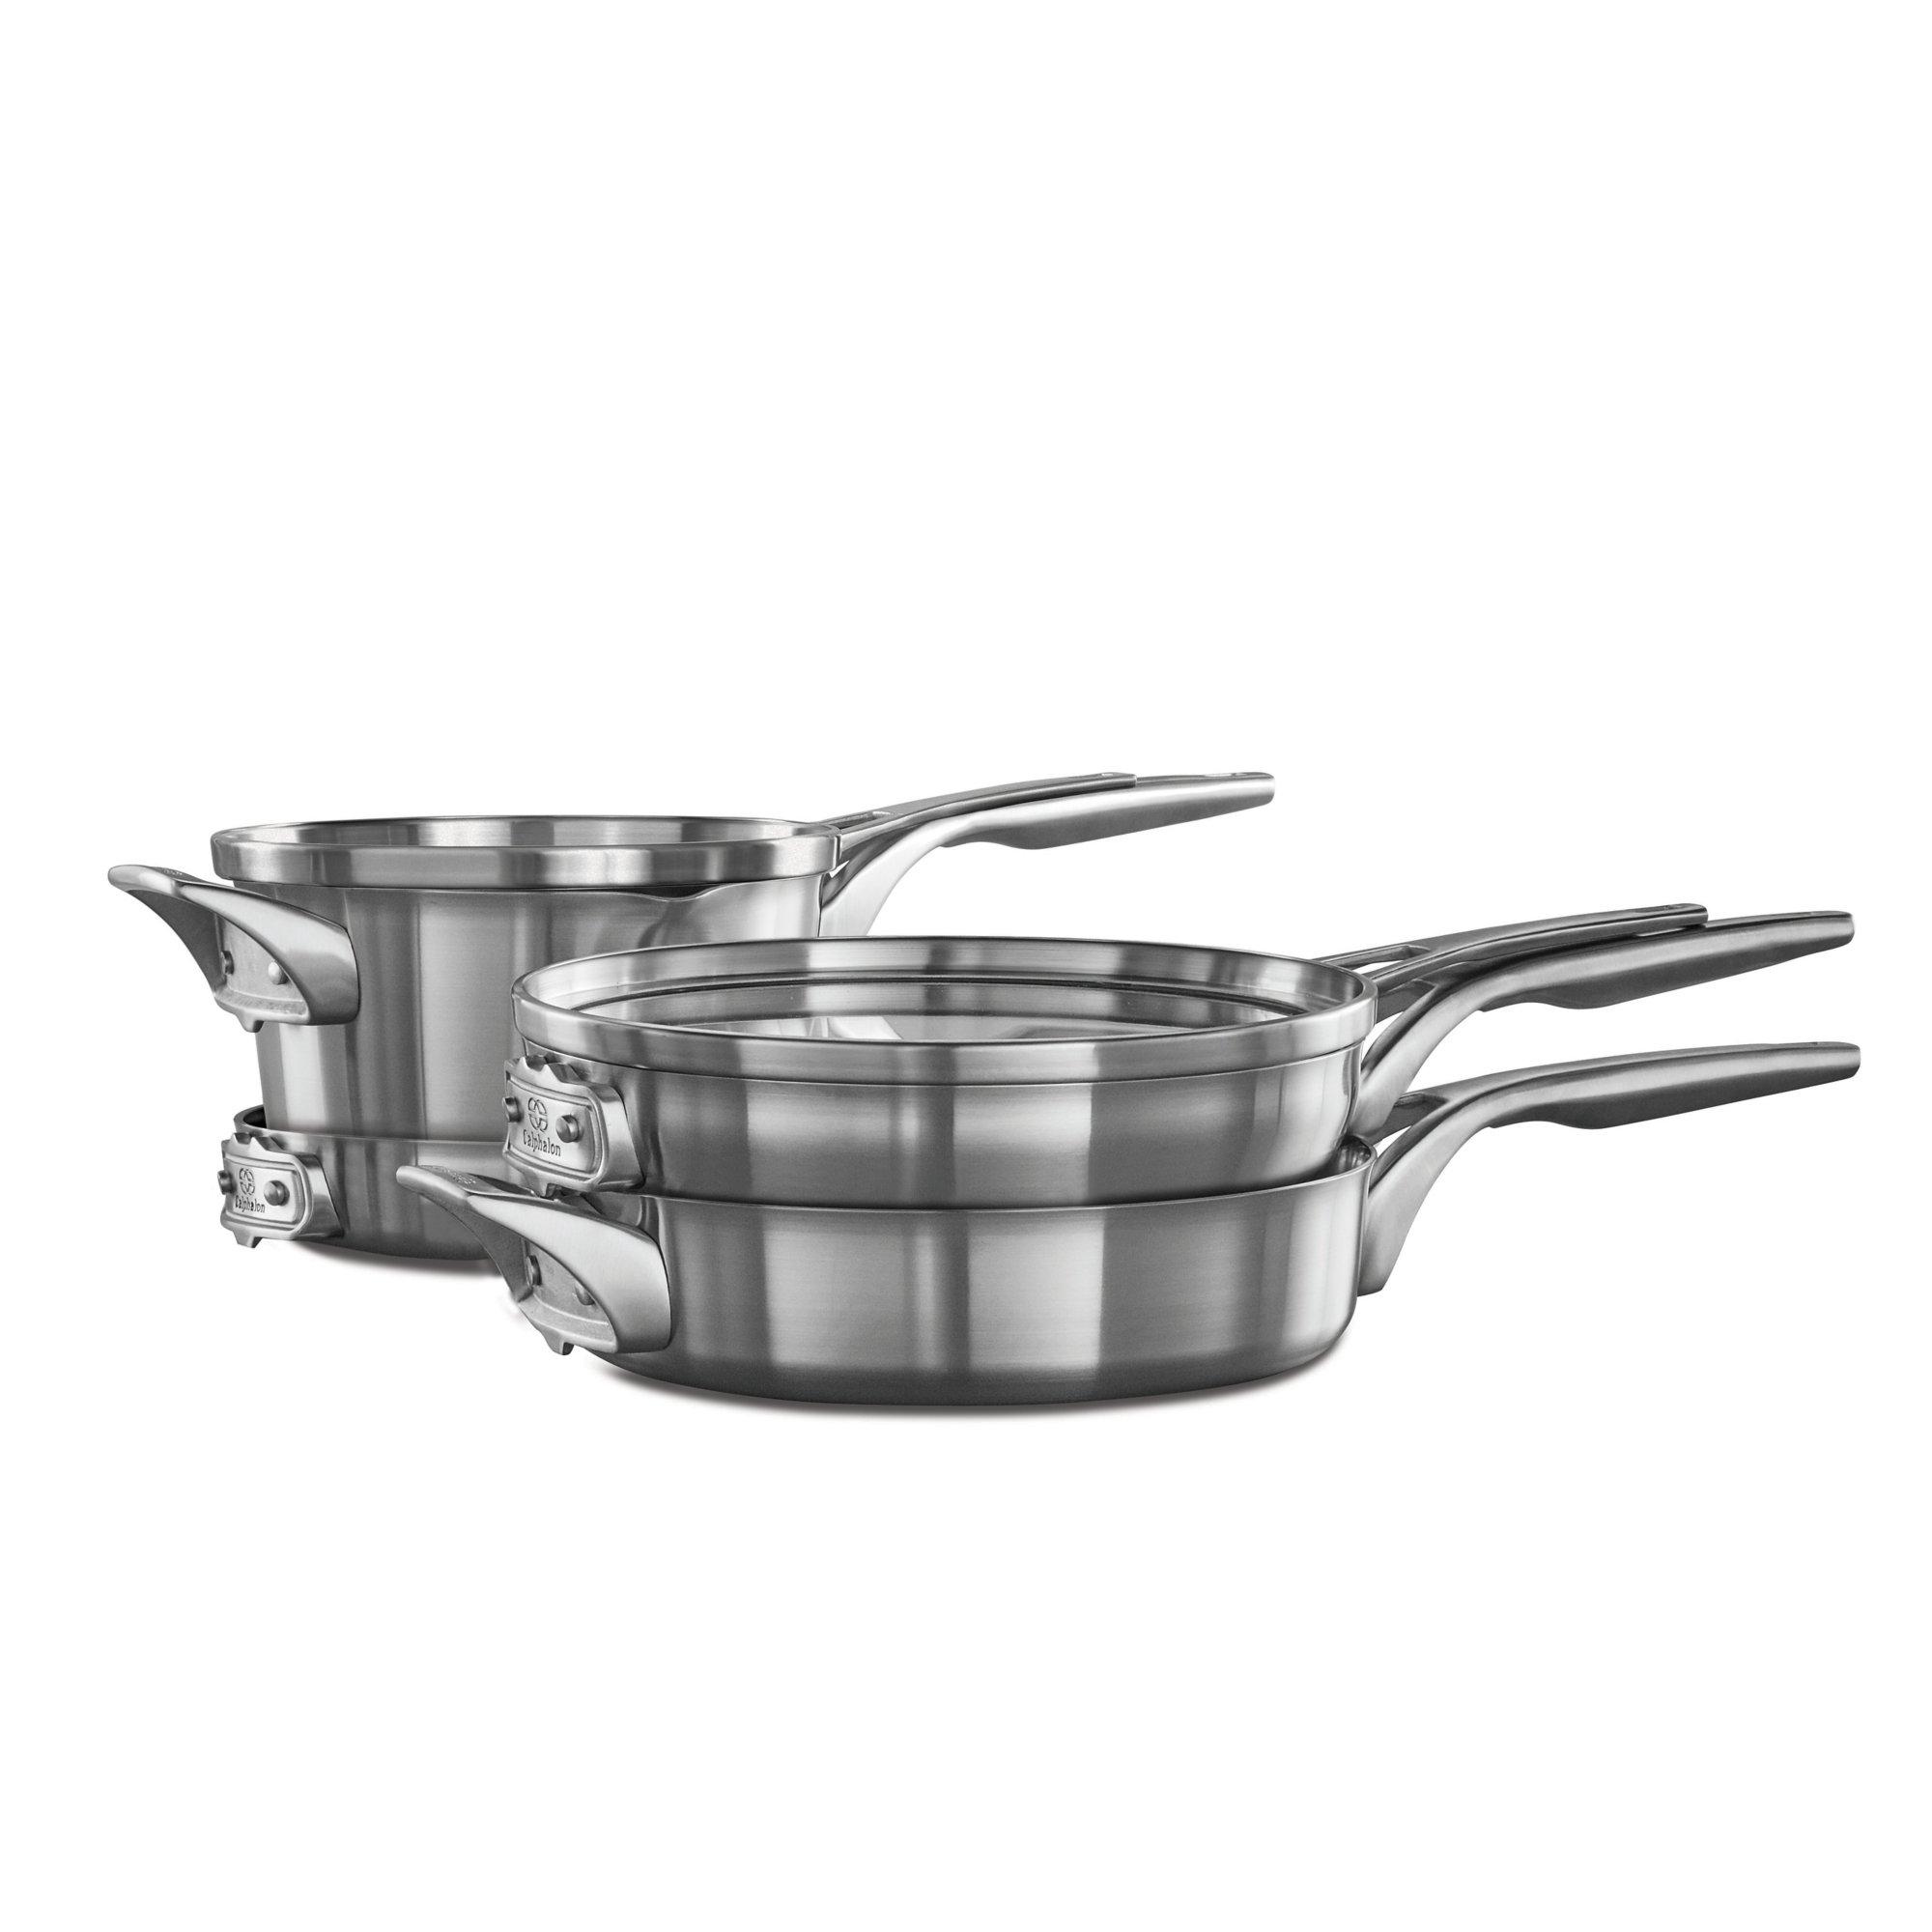 Calphalon Premier? Space Saving Stainless Steel 6-Piece Cookware Set